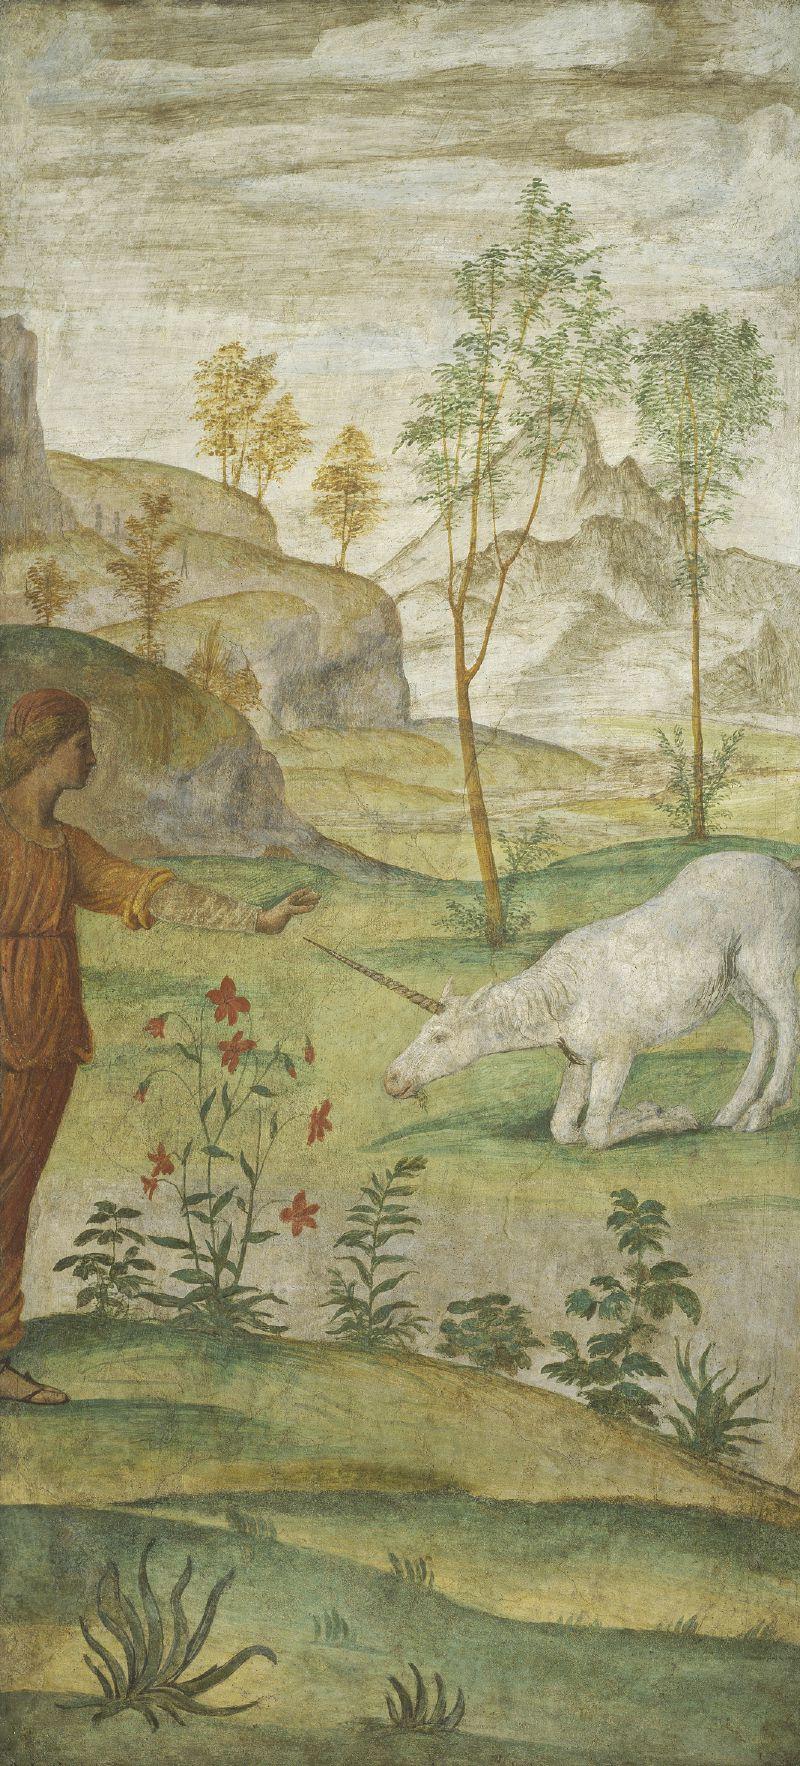 Procris and the Unicorn (c. 1520-1522)